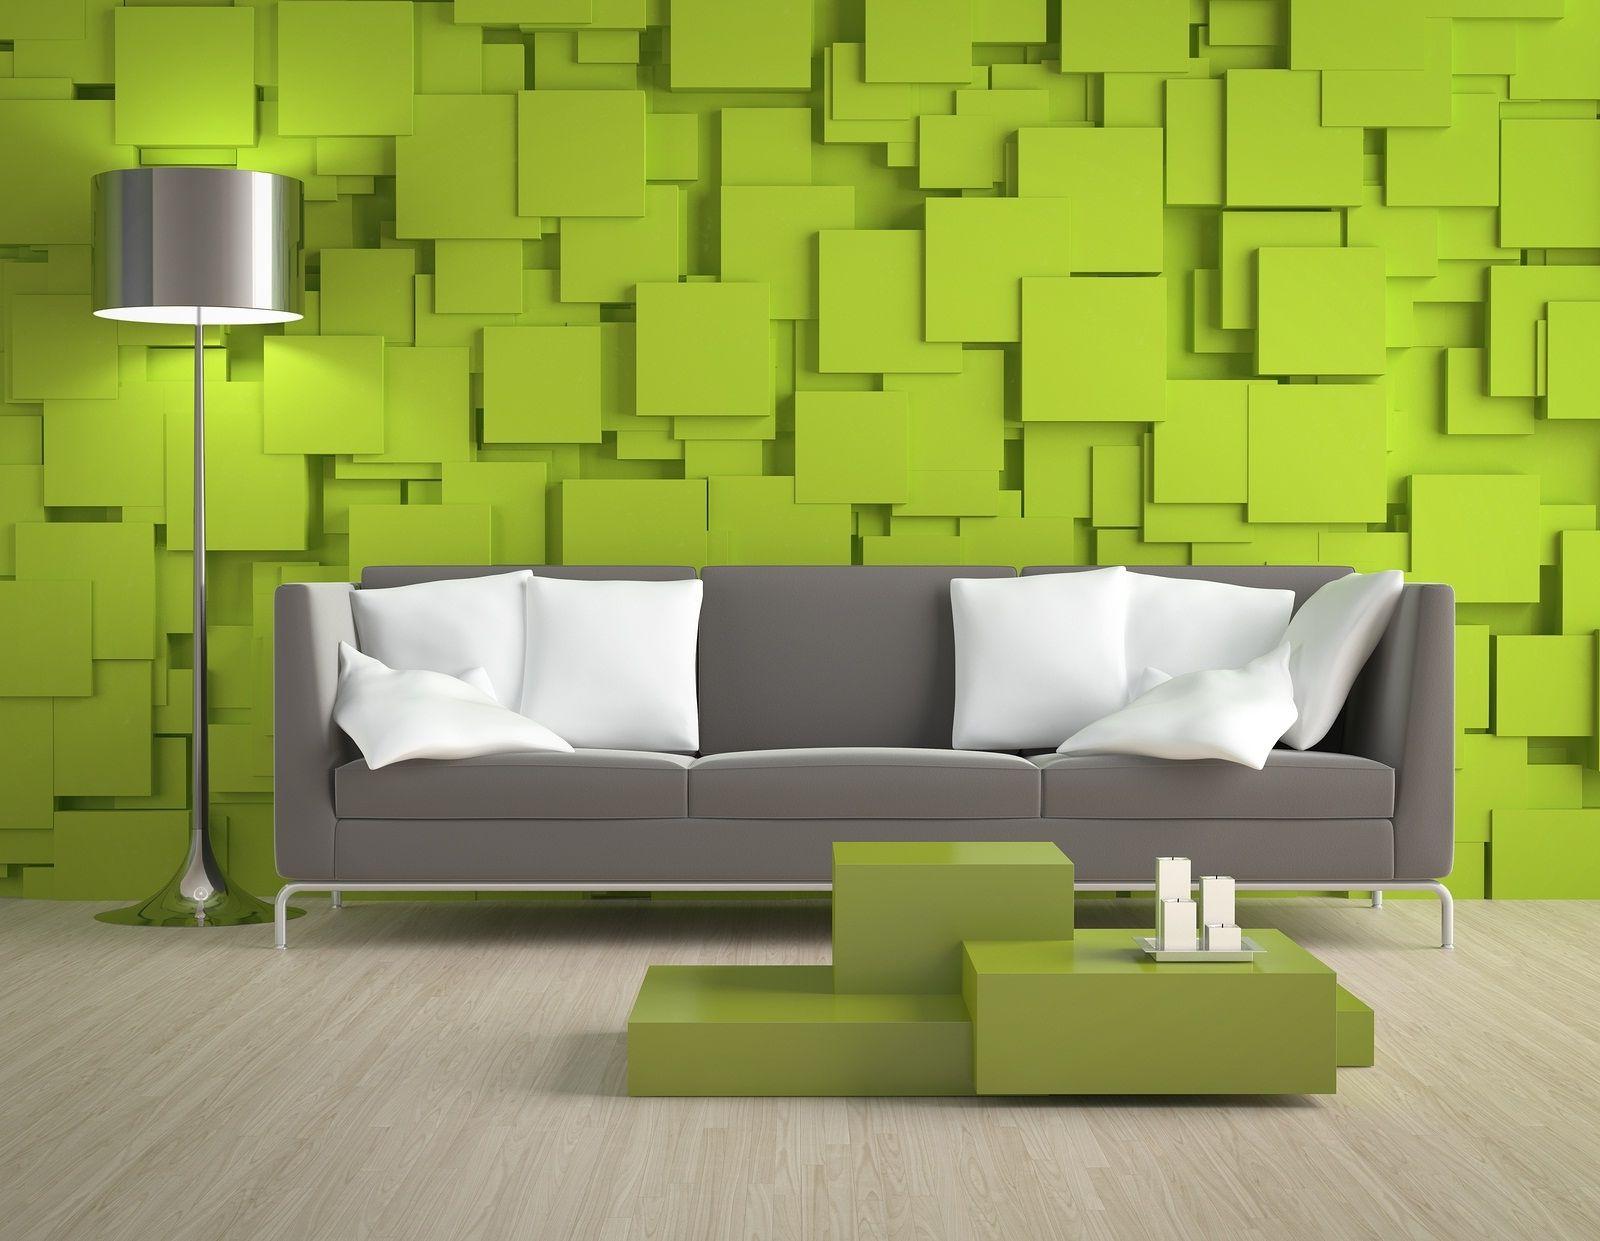 Lime Green Living Room pindépartement design tfo on mini virtuelle neutre | pinterest